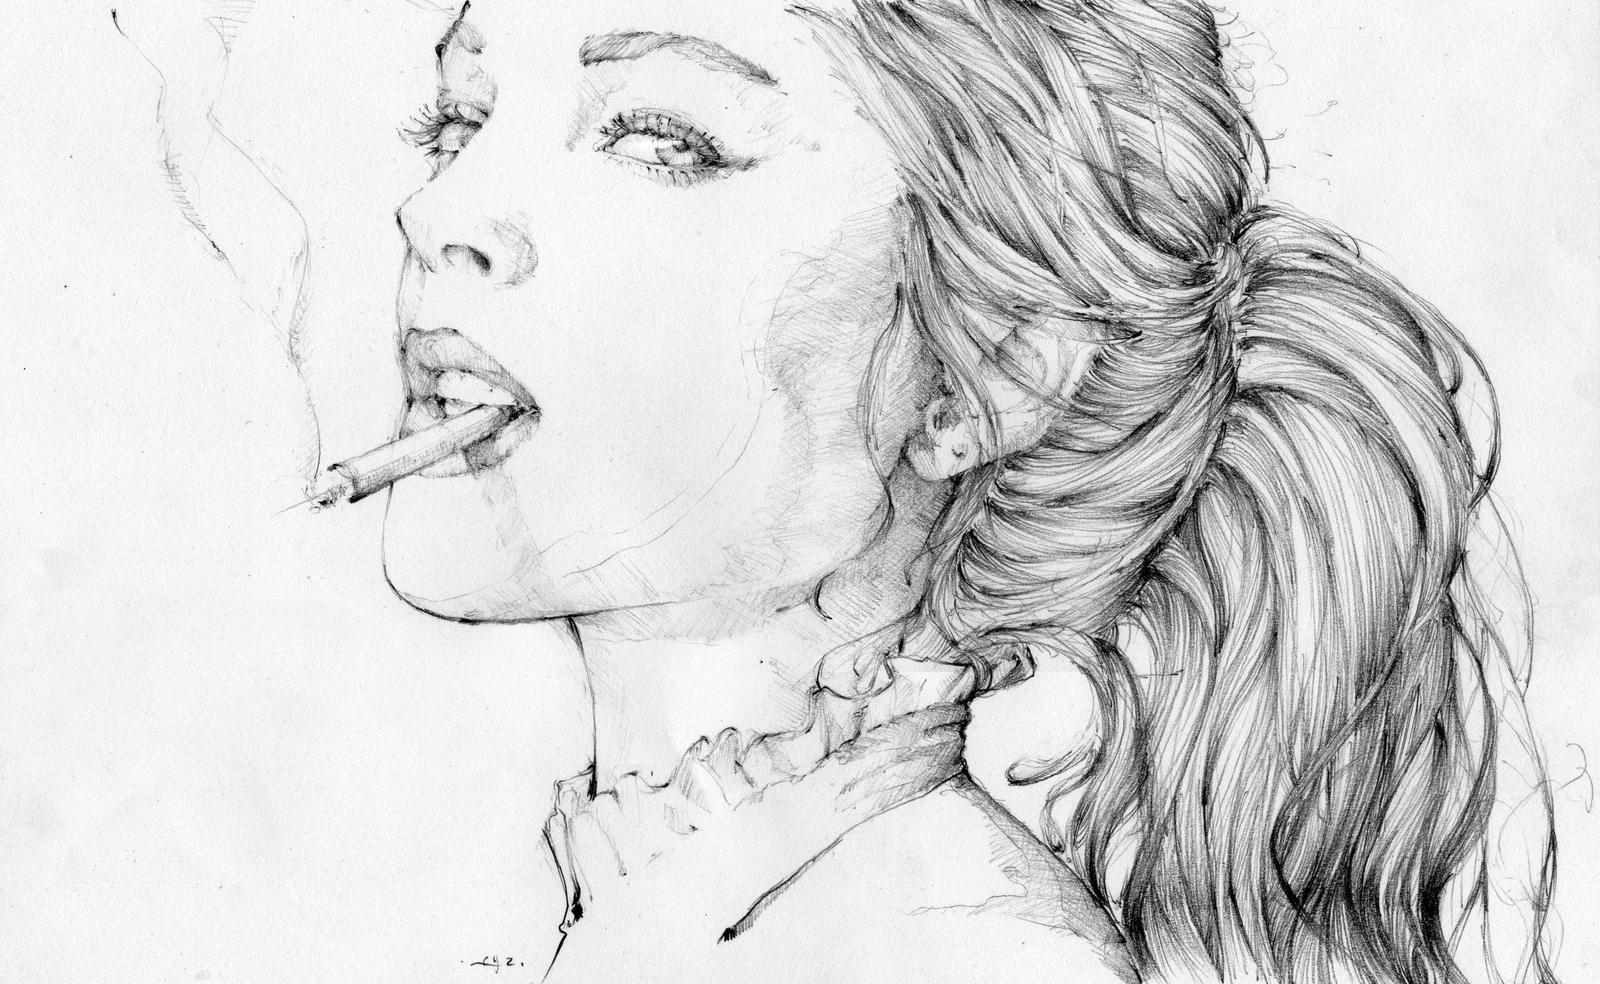 we lost on earth _ Lindsay Lohan by grafnarq on DeviantArt